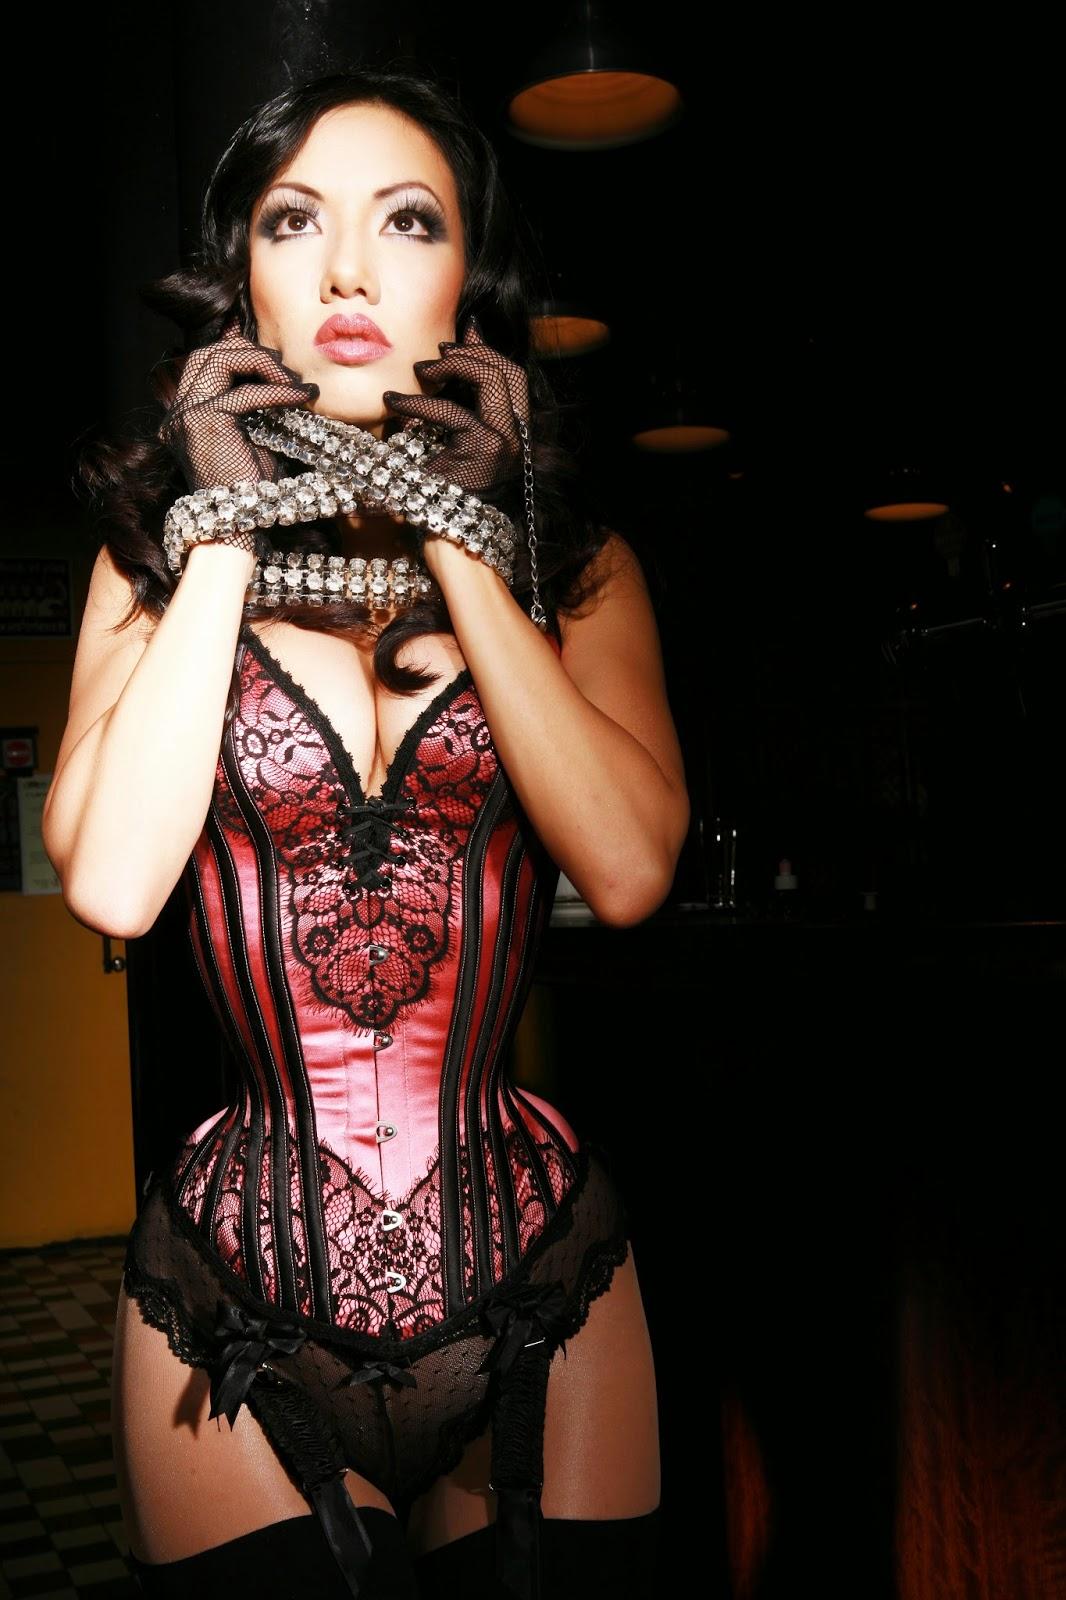 Jade Vixen: Lovesick Corsets: Jade Vixen Photographed By Christophe